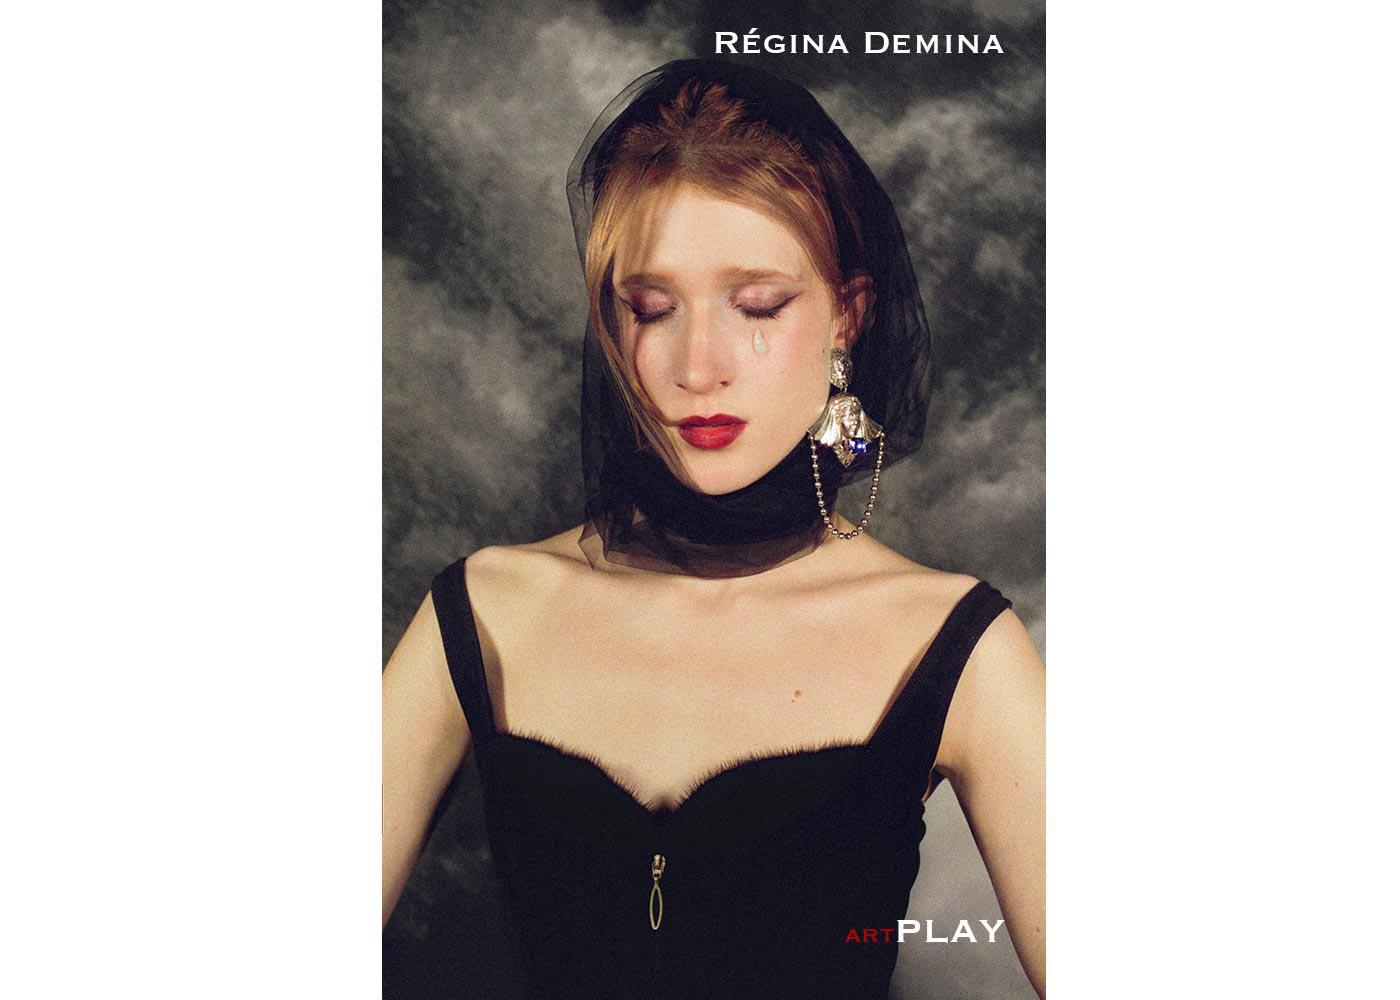 Interview feature Regina Demina   ART PLAY MAGAZINE